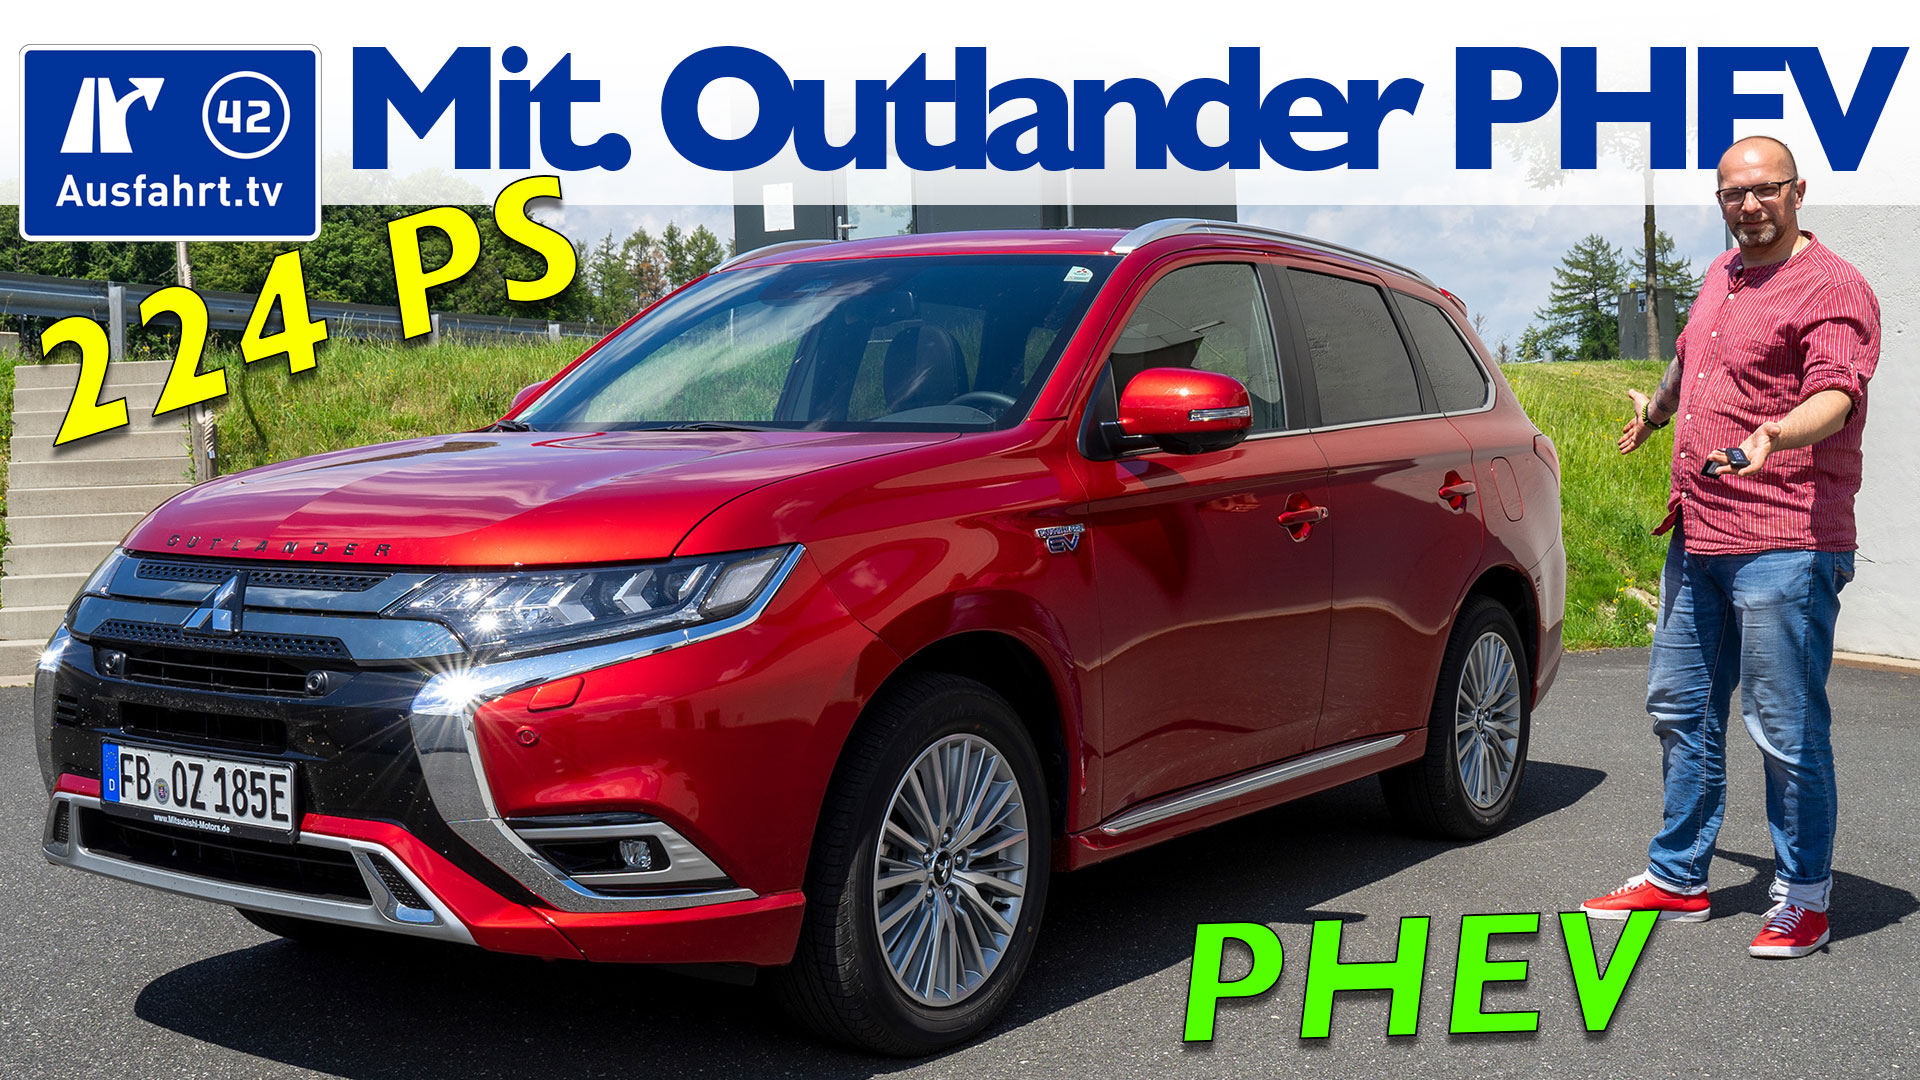 2020 Mitsubishi Outlander Price and Review